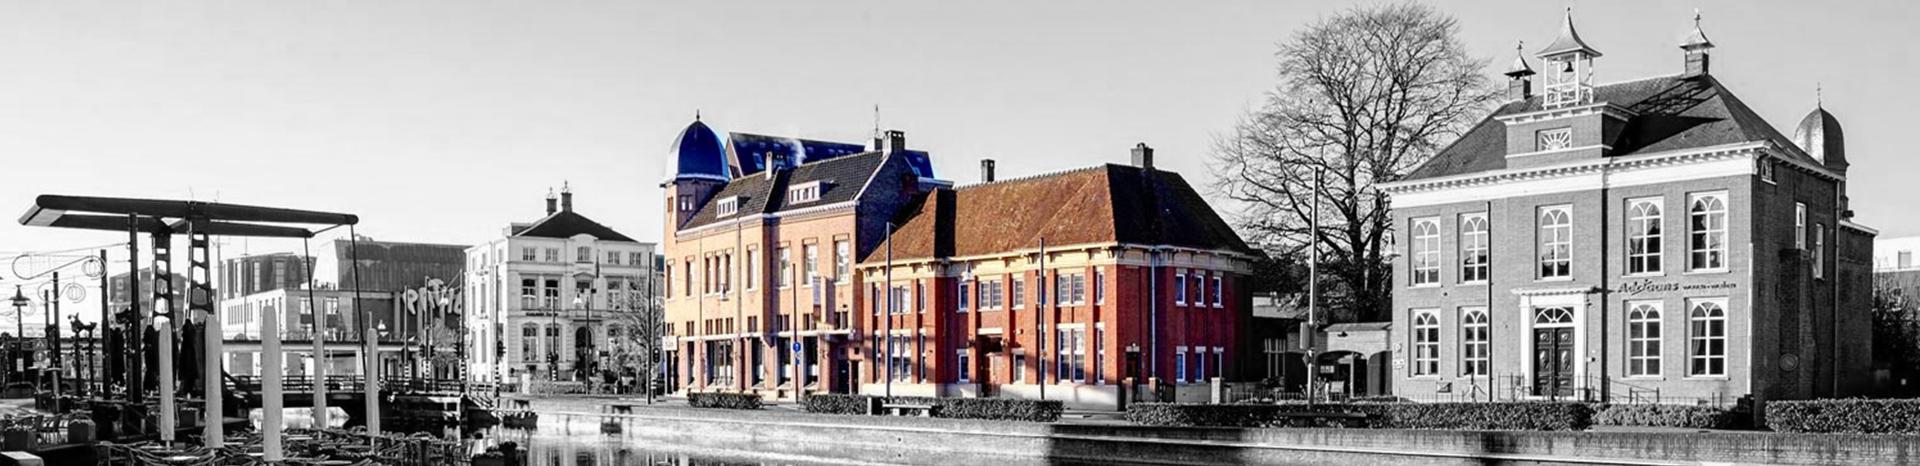 Letselschade advocaat Helmond | LetselPro